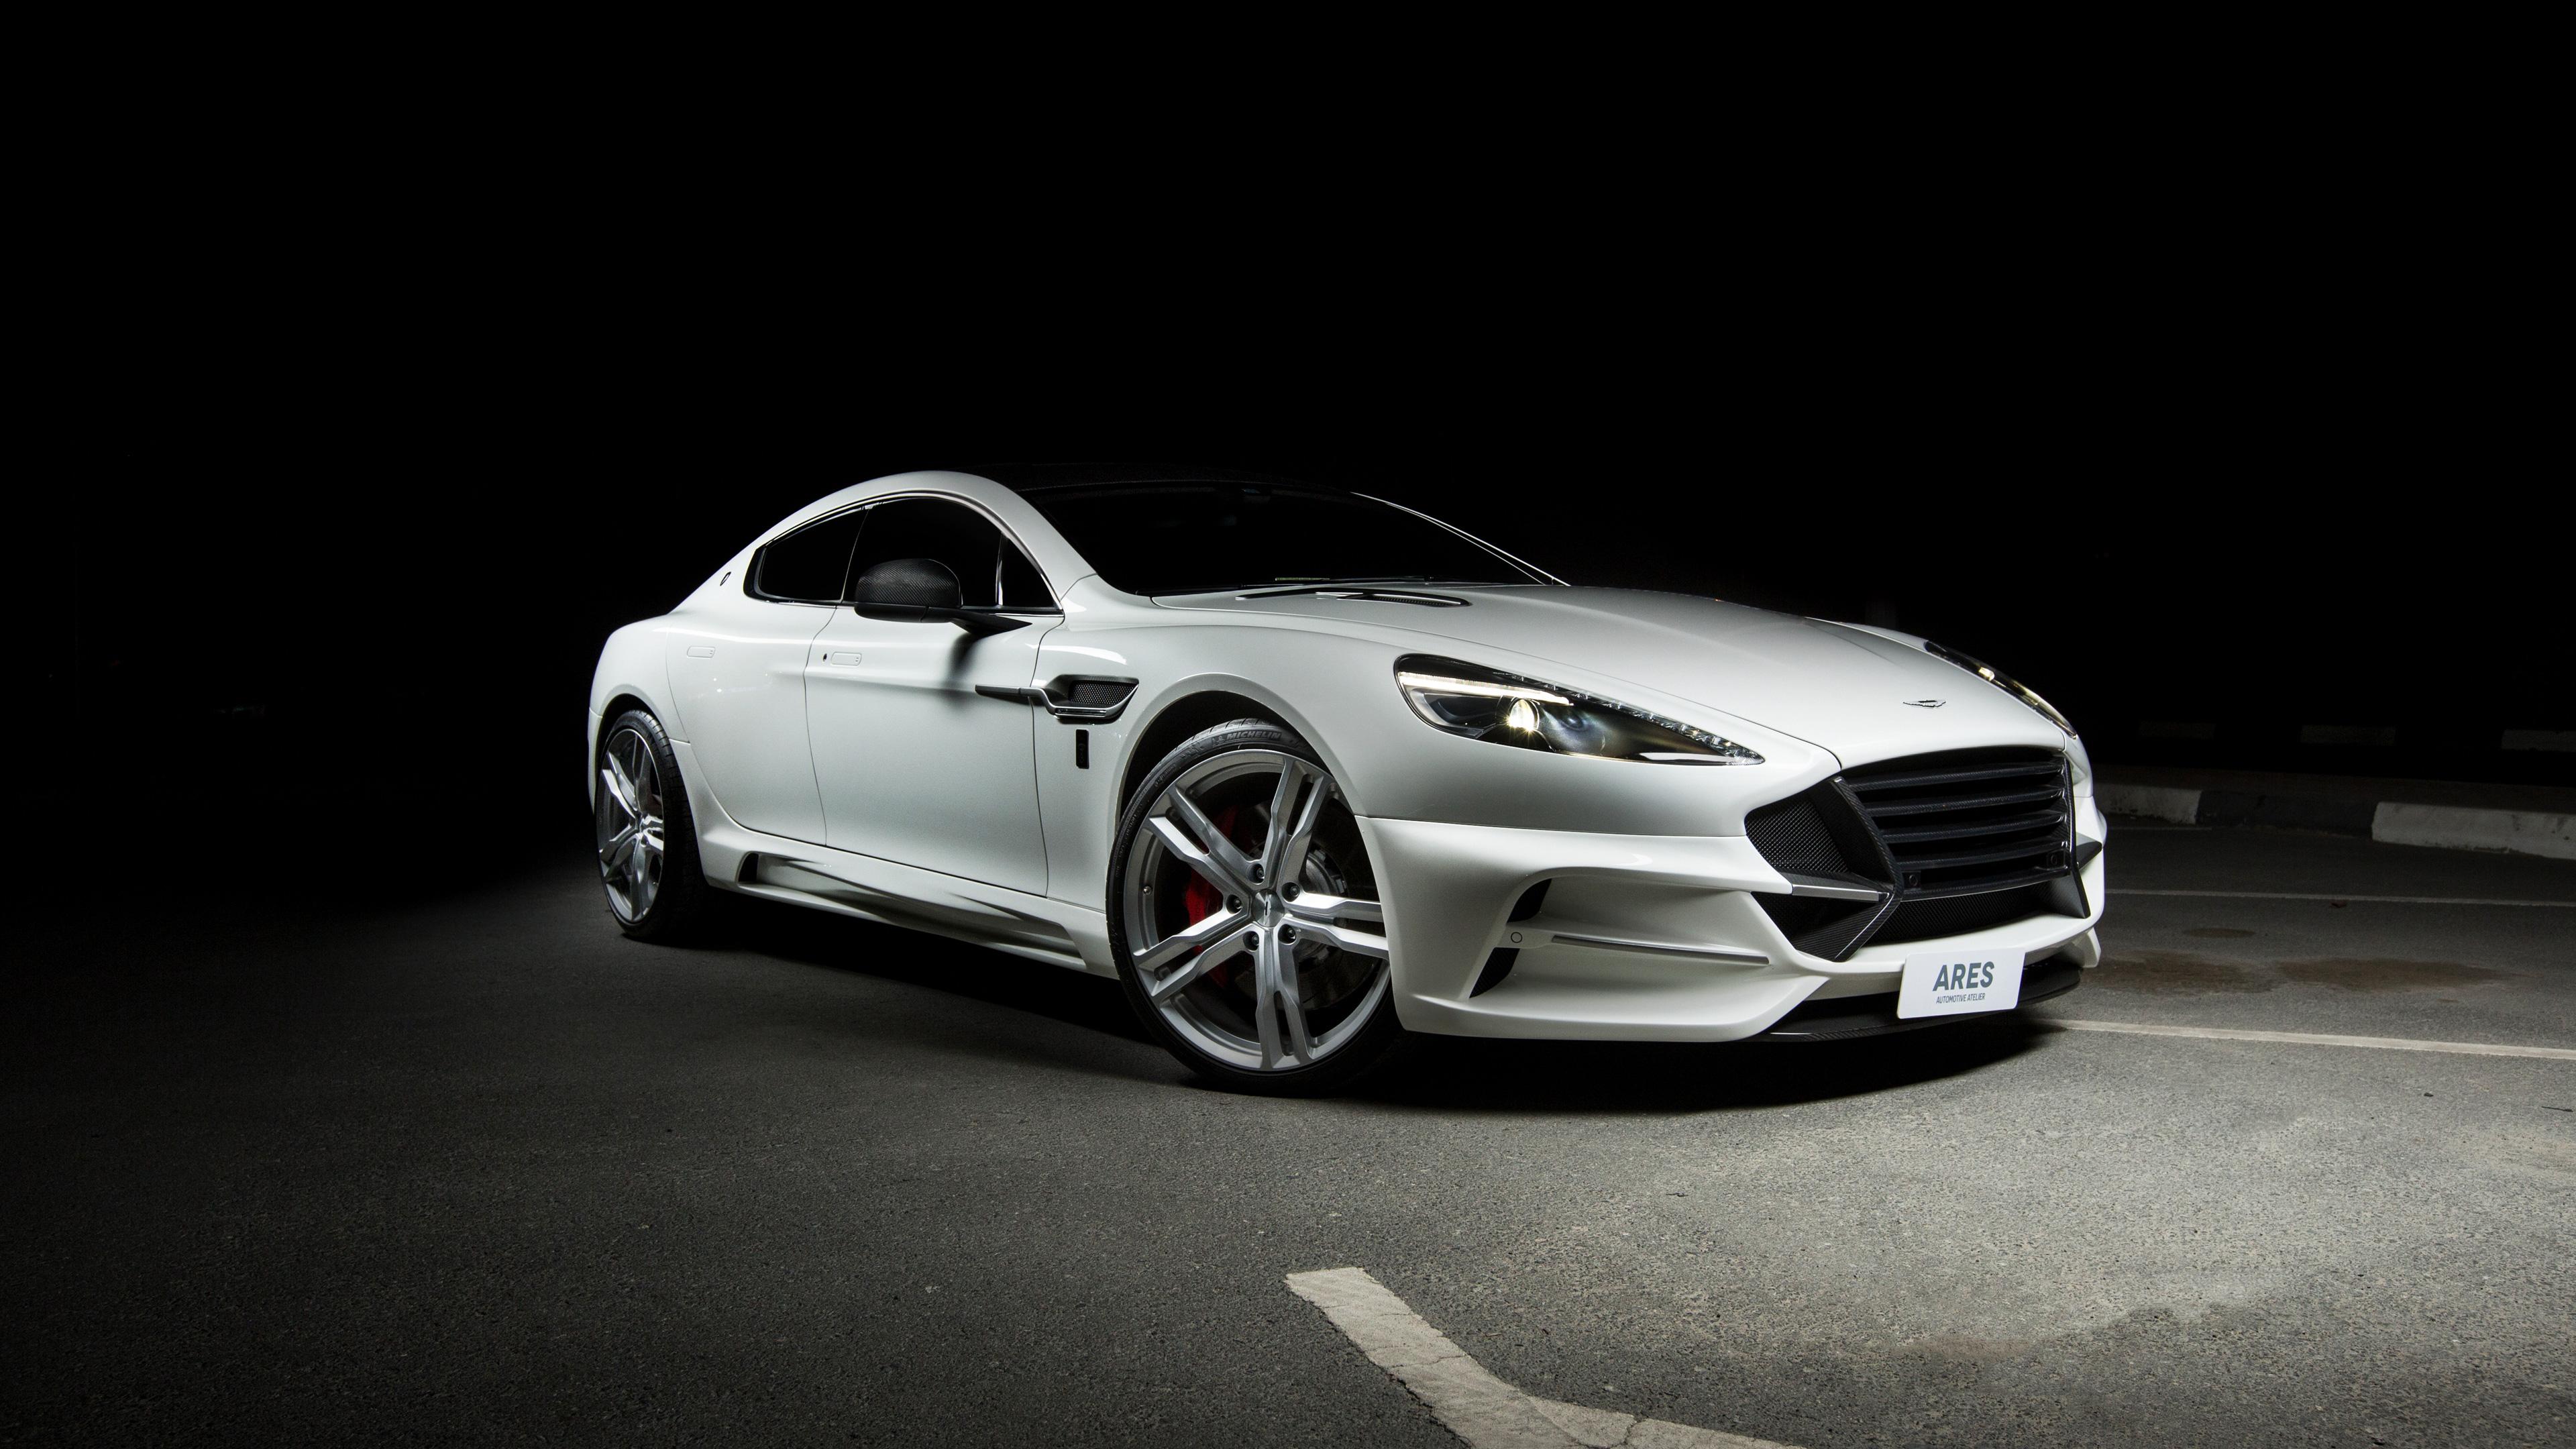 Audi Car Full Hd Wallpaper Download Ares Design Aston Martin Rapide S Wallpaper Hd Car